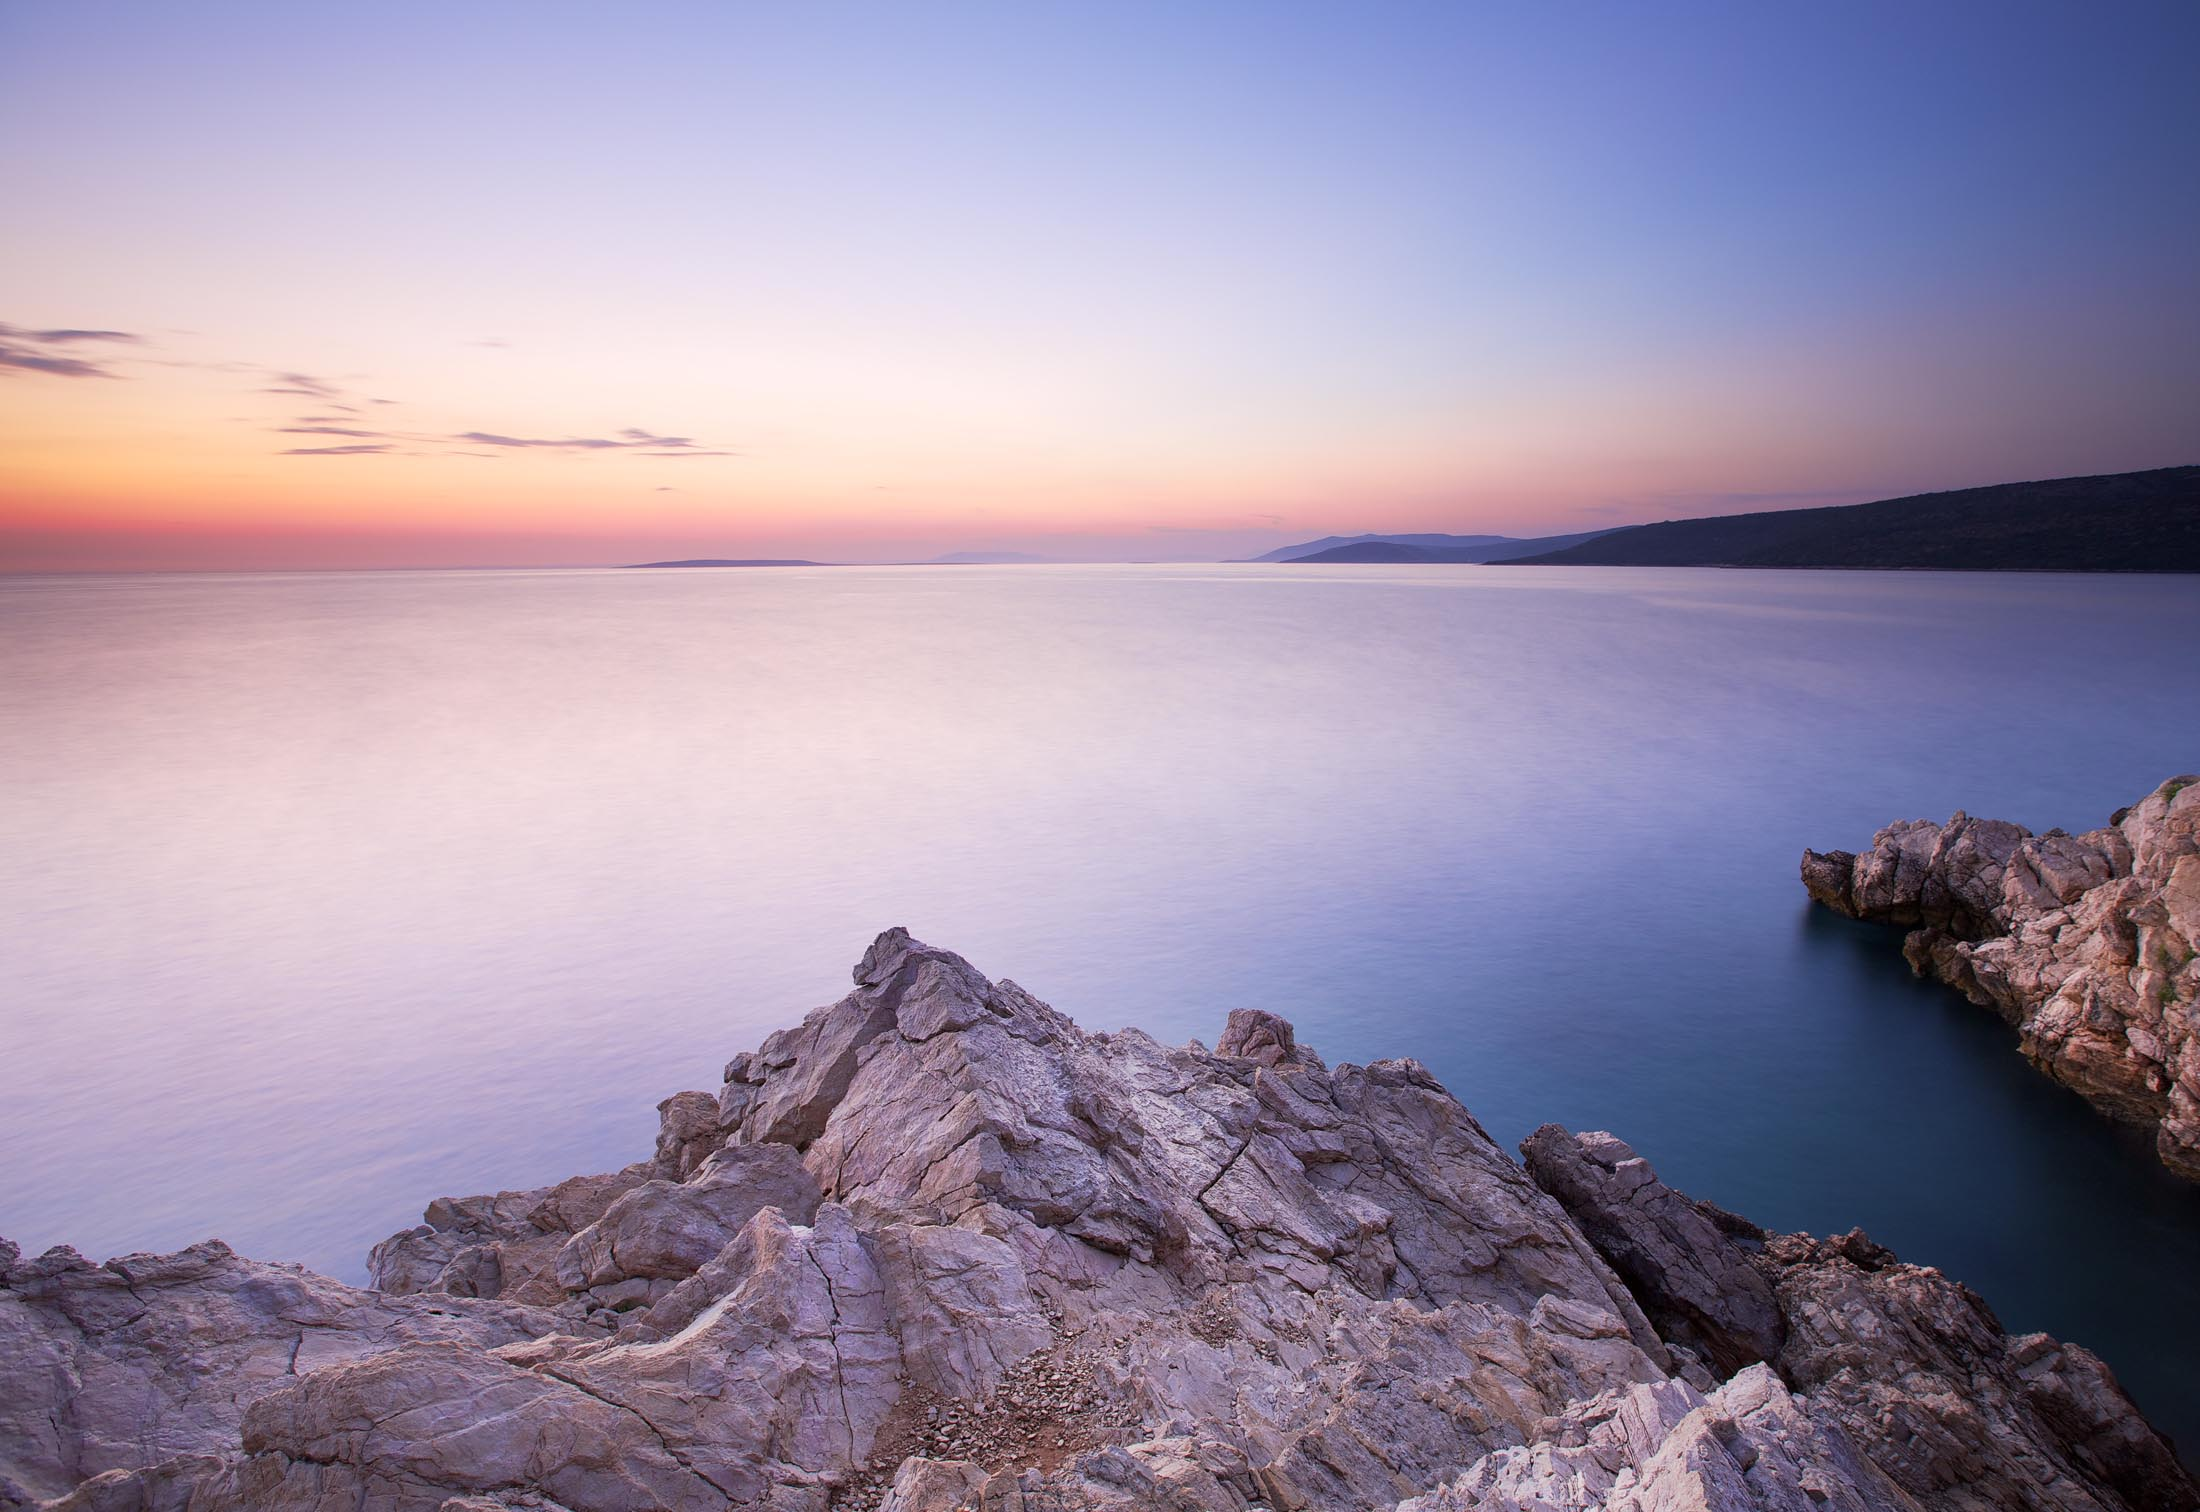 Sunset on Cres Island, Croatia